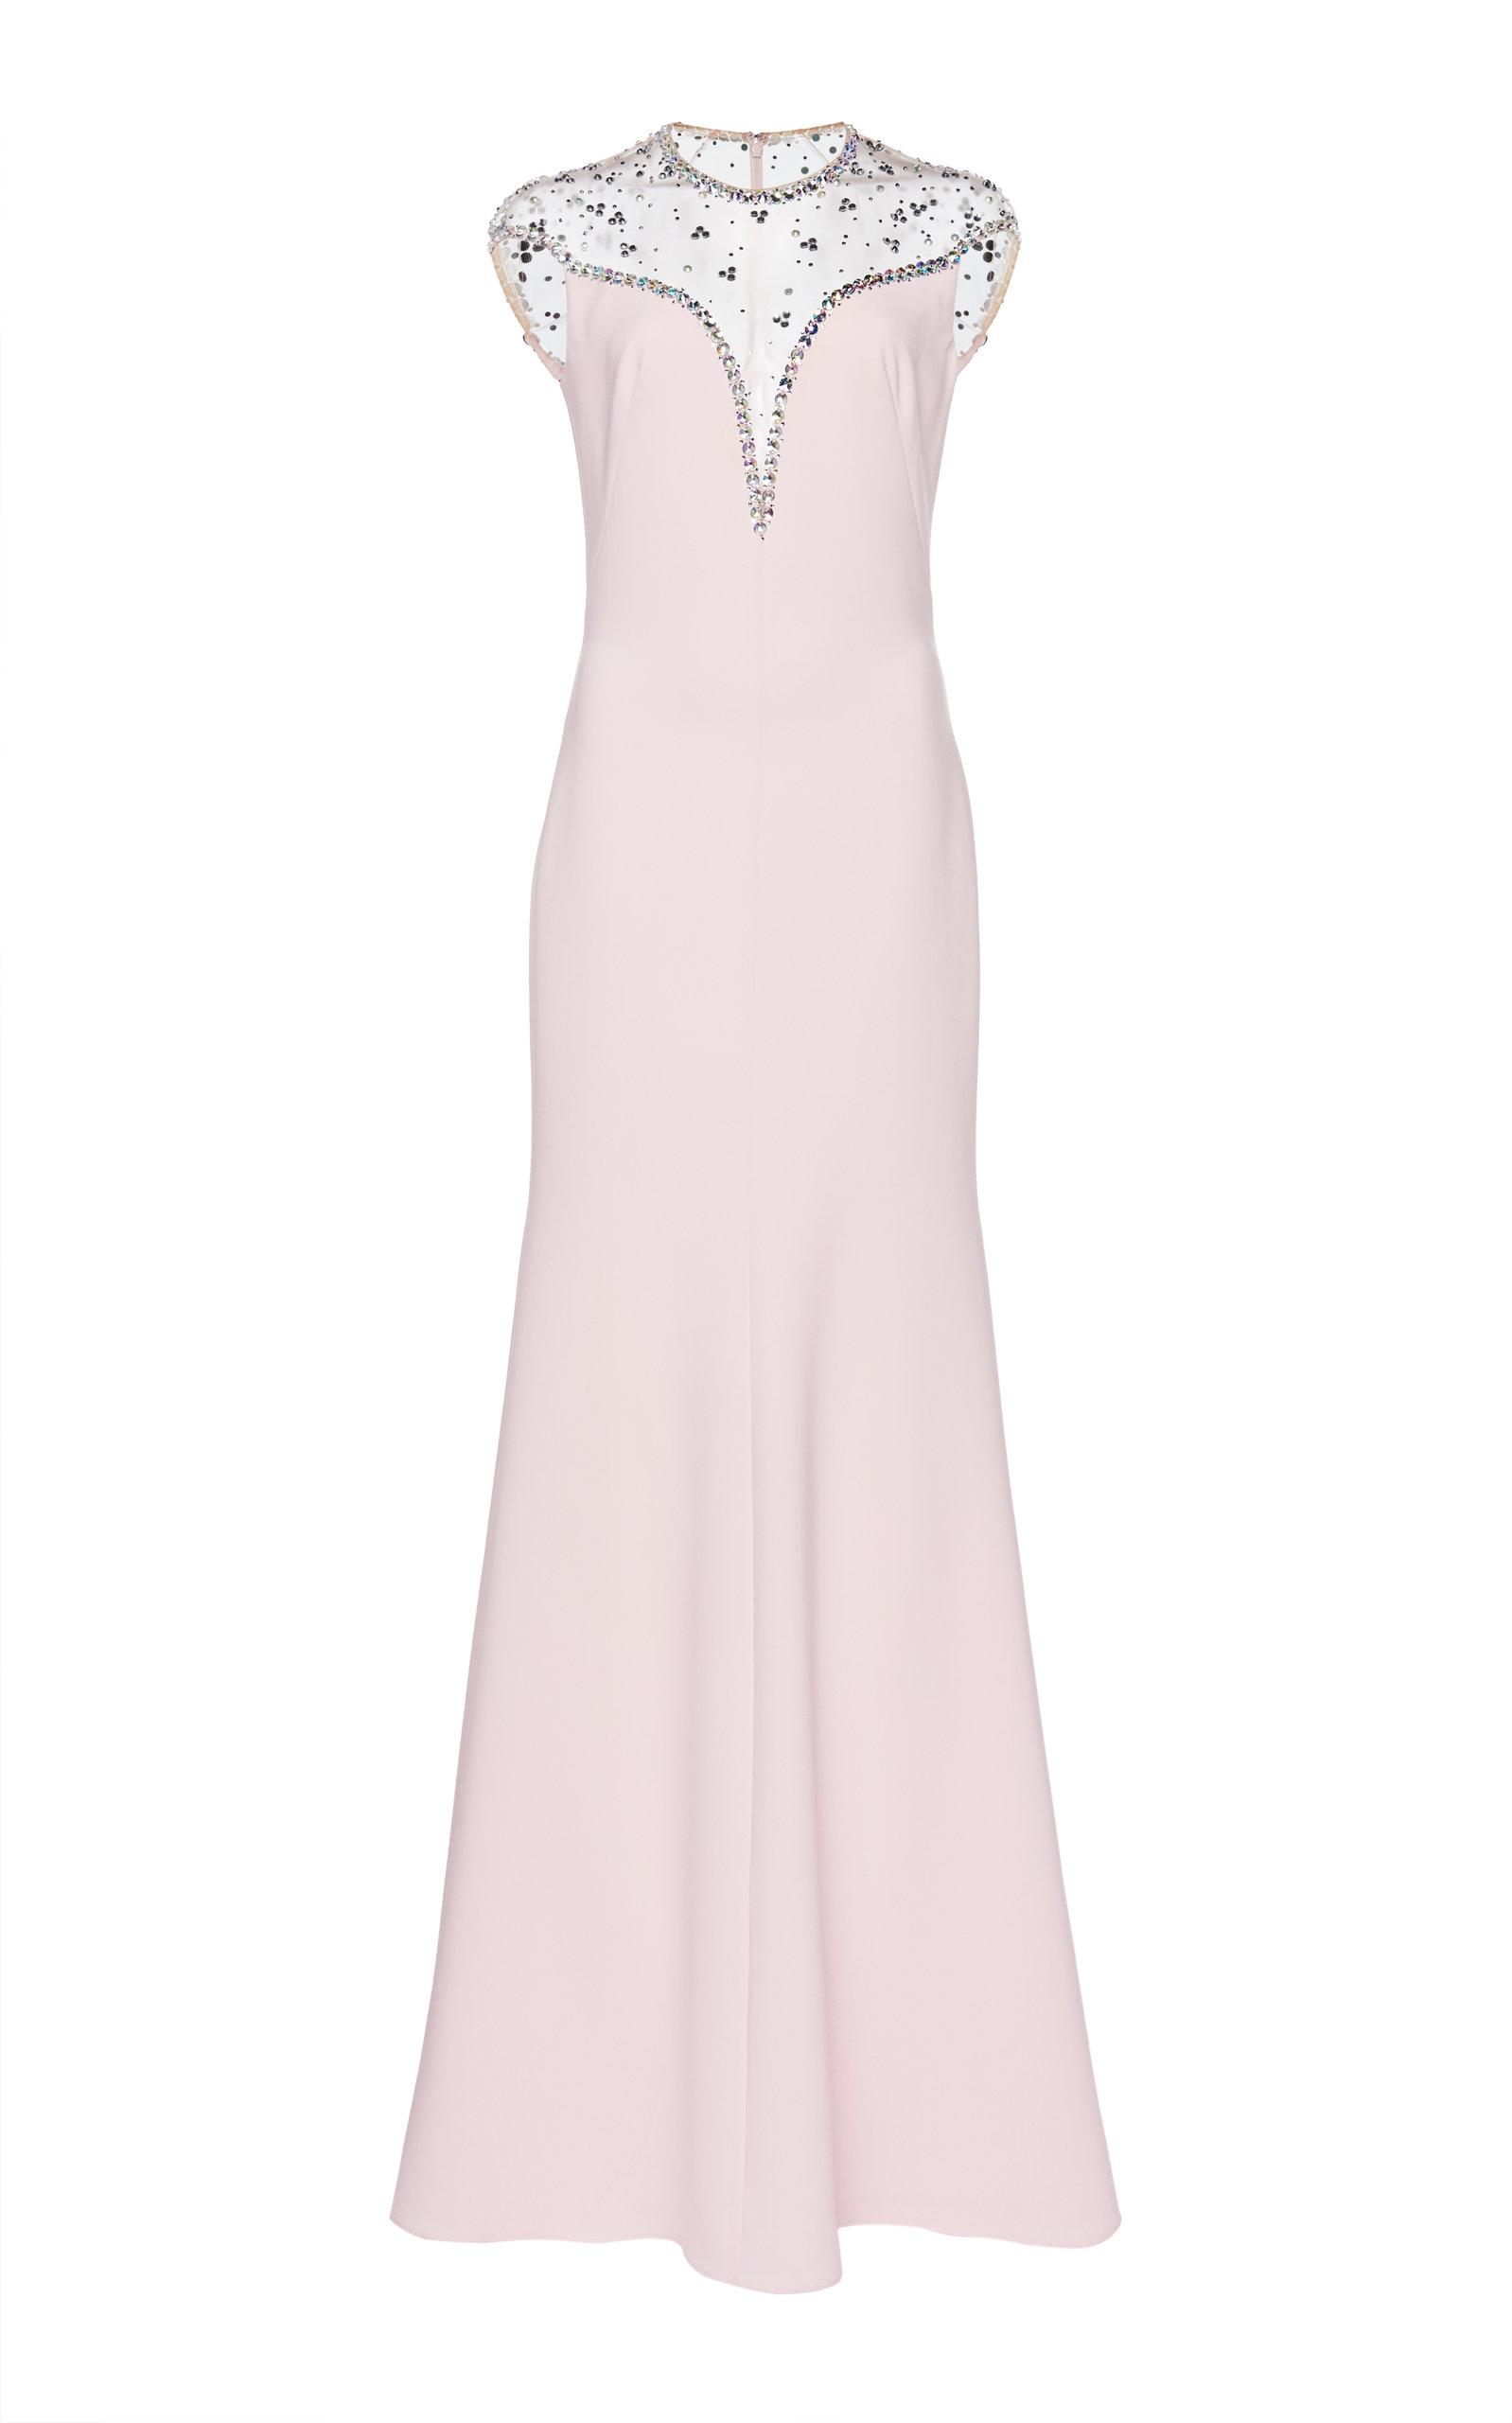 Buy Jenny Packham Illusion Neckline Embellished Satin Dress online, shop Jenny Packham at the best price